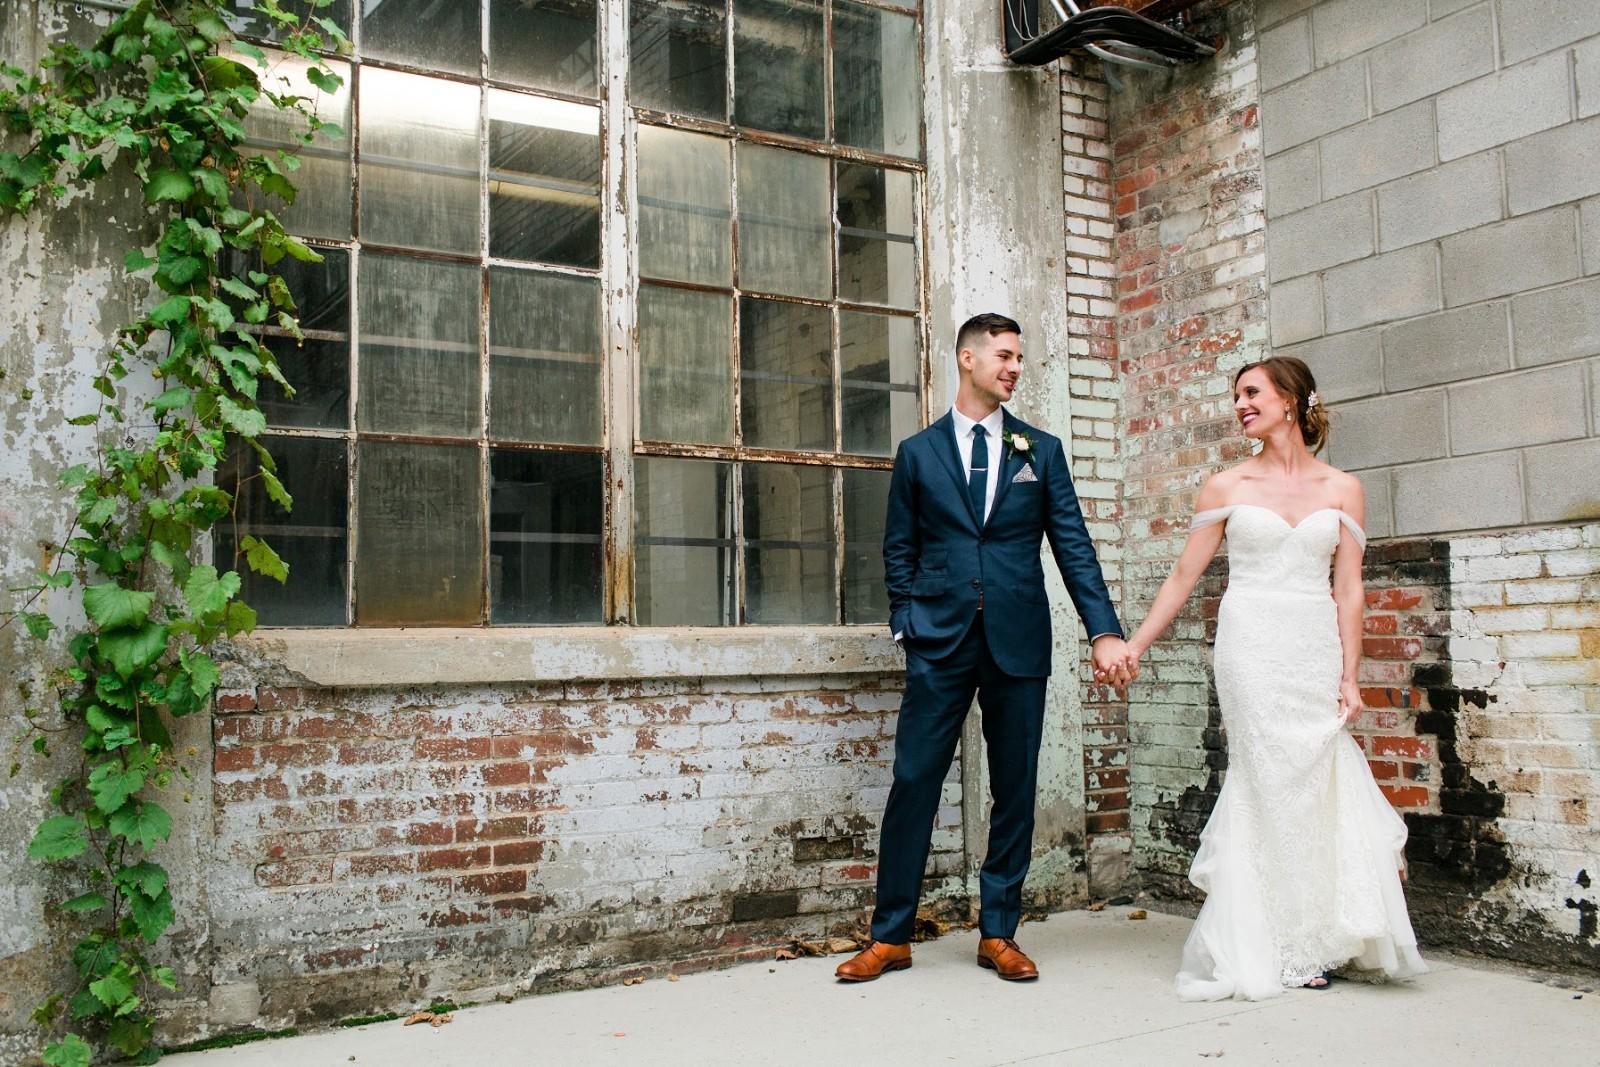 vince-leigh-wedding-outdoor-glass-brick-cement